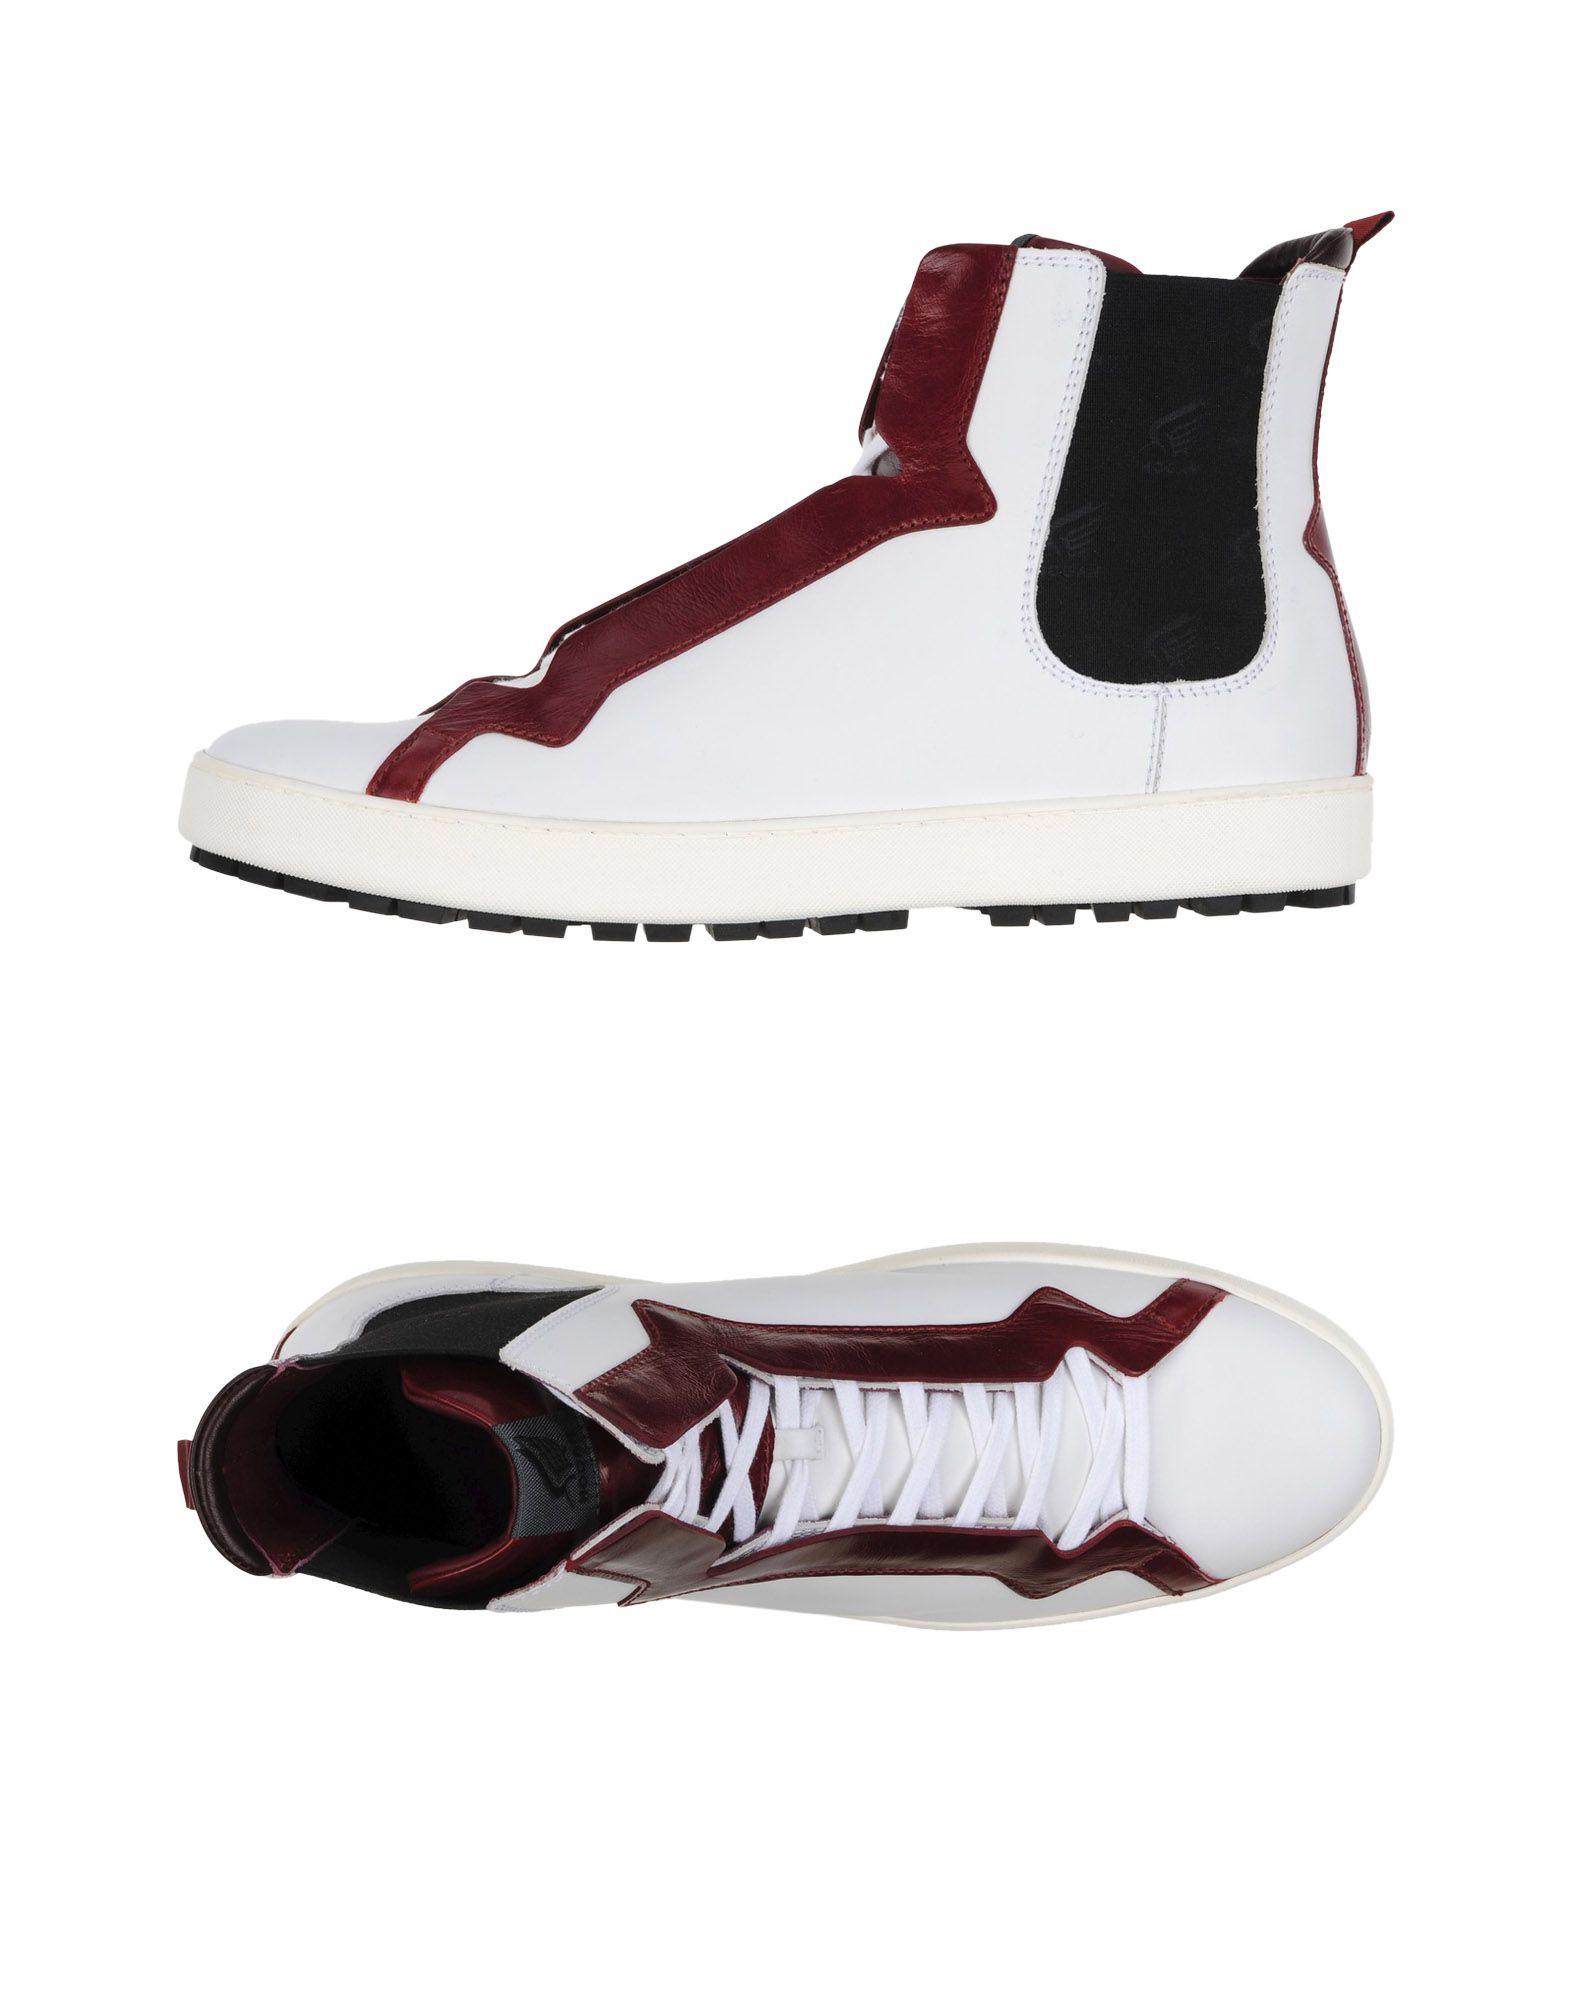 Hogan Sneakers Herren Schuhe  11298022XE Heiße Schuhe Herren 689cf0